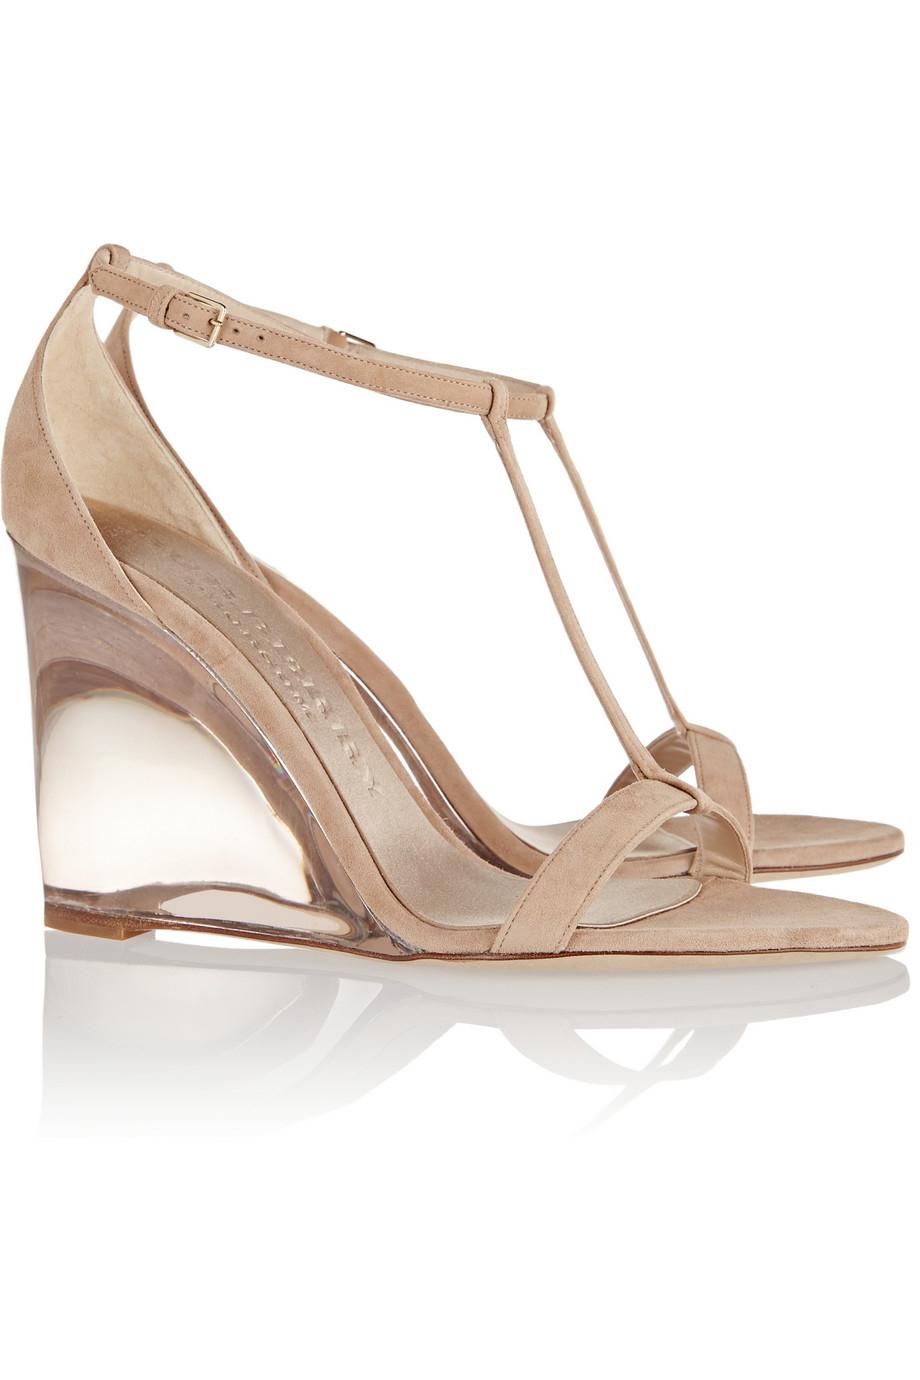 burberry prorsum leyburn suede wedge sandals in beige lyst